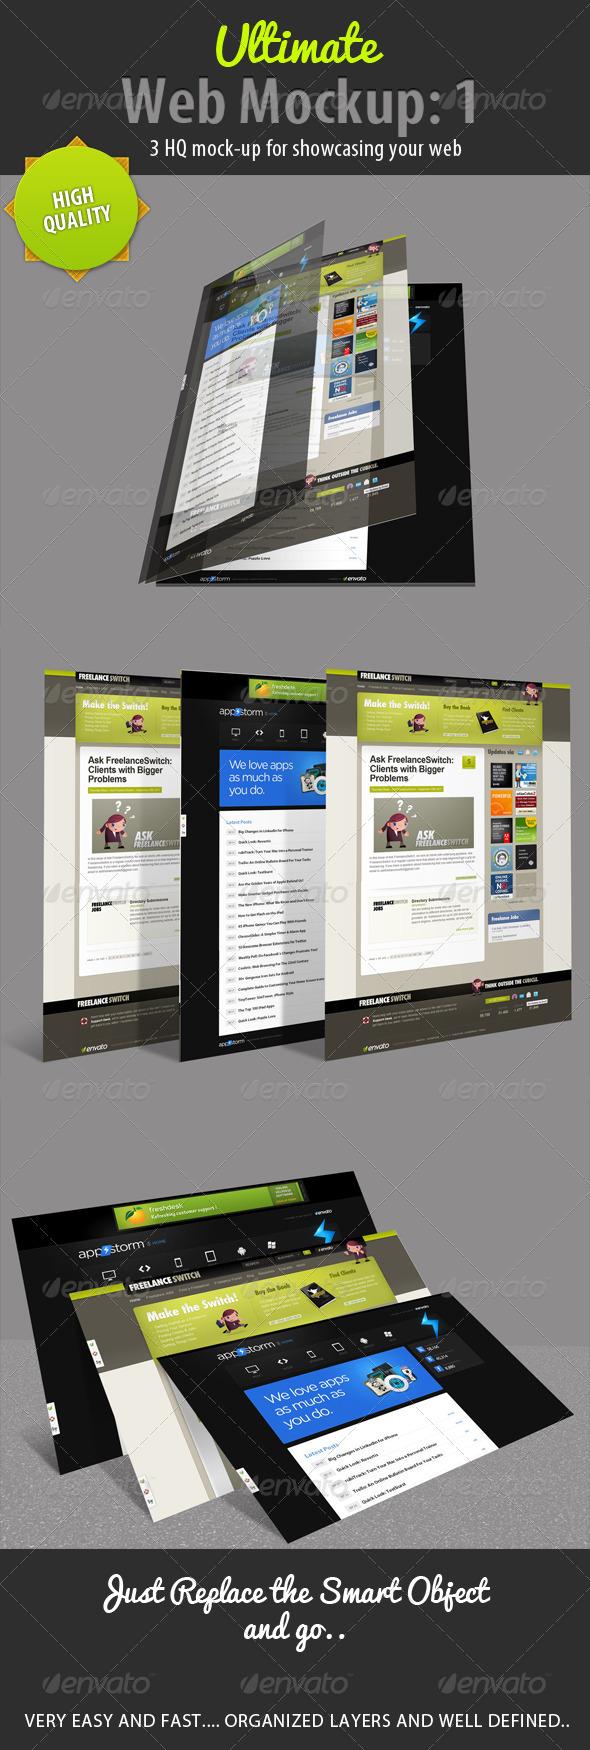 GraphicRiver Ultimate Web Mockup Pack 1 4575530